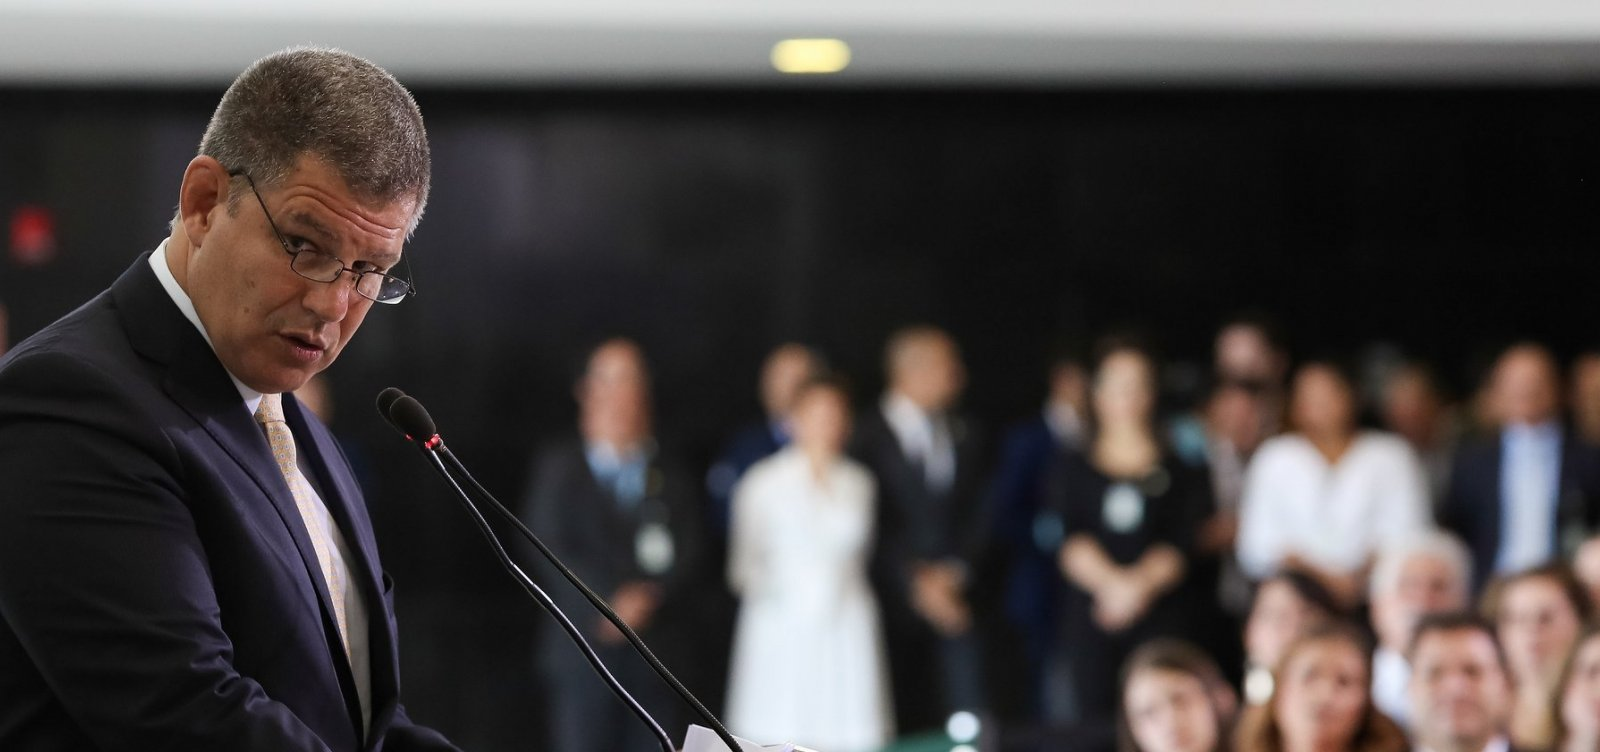 Bebianno divulga áudios que desmentem Bolsonaro; confira